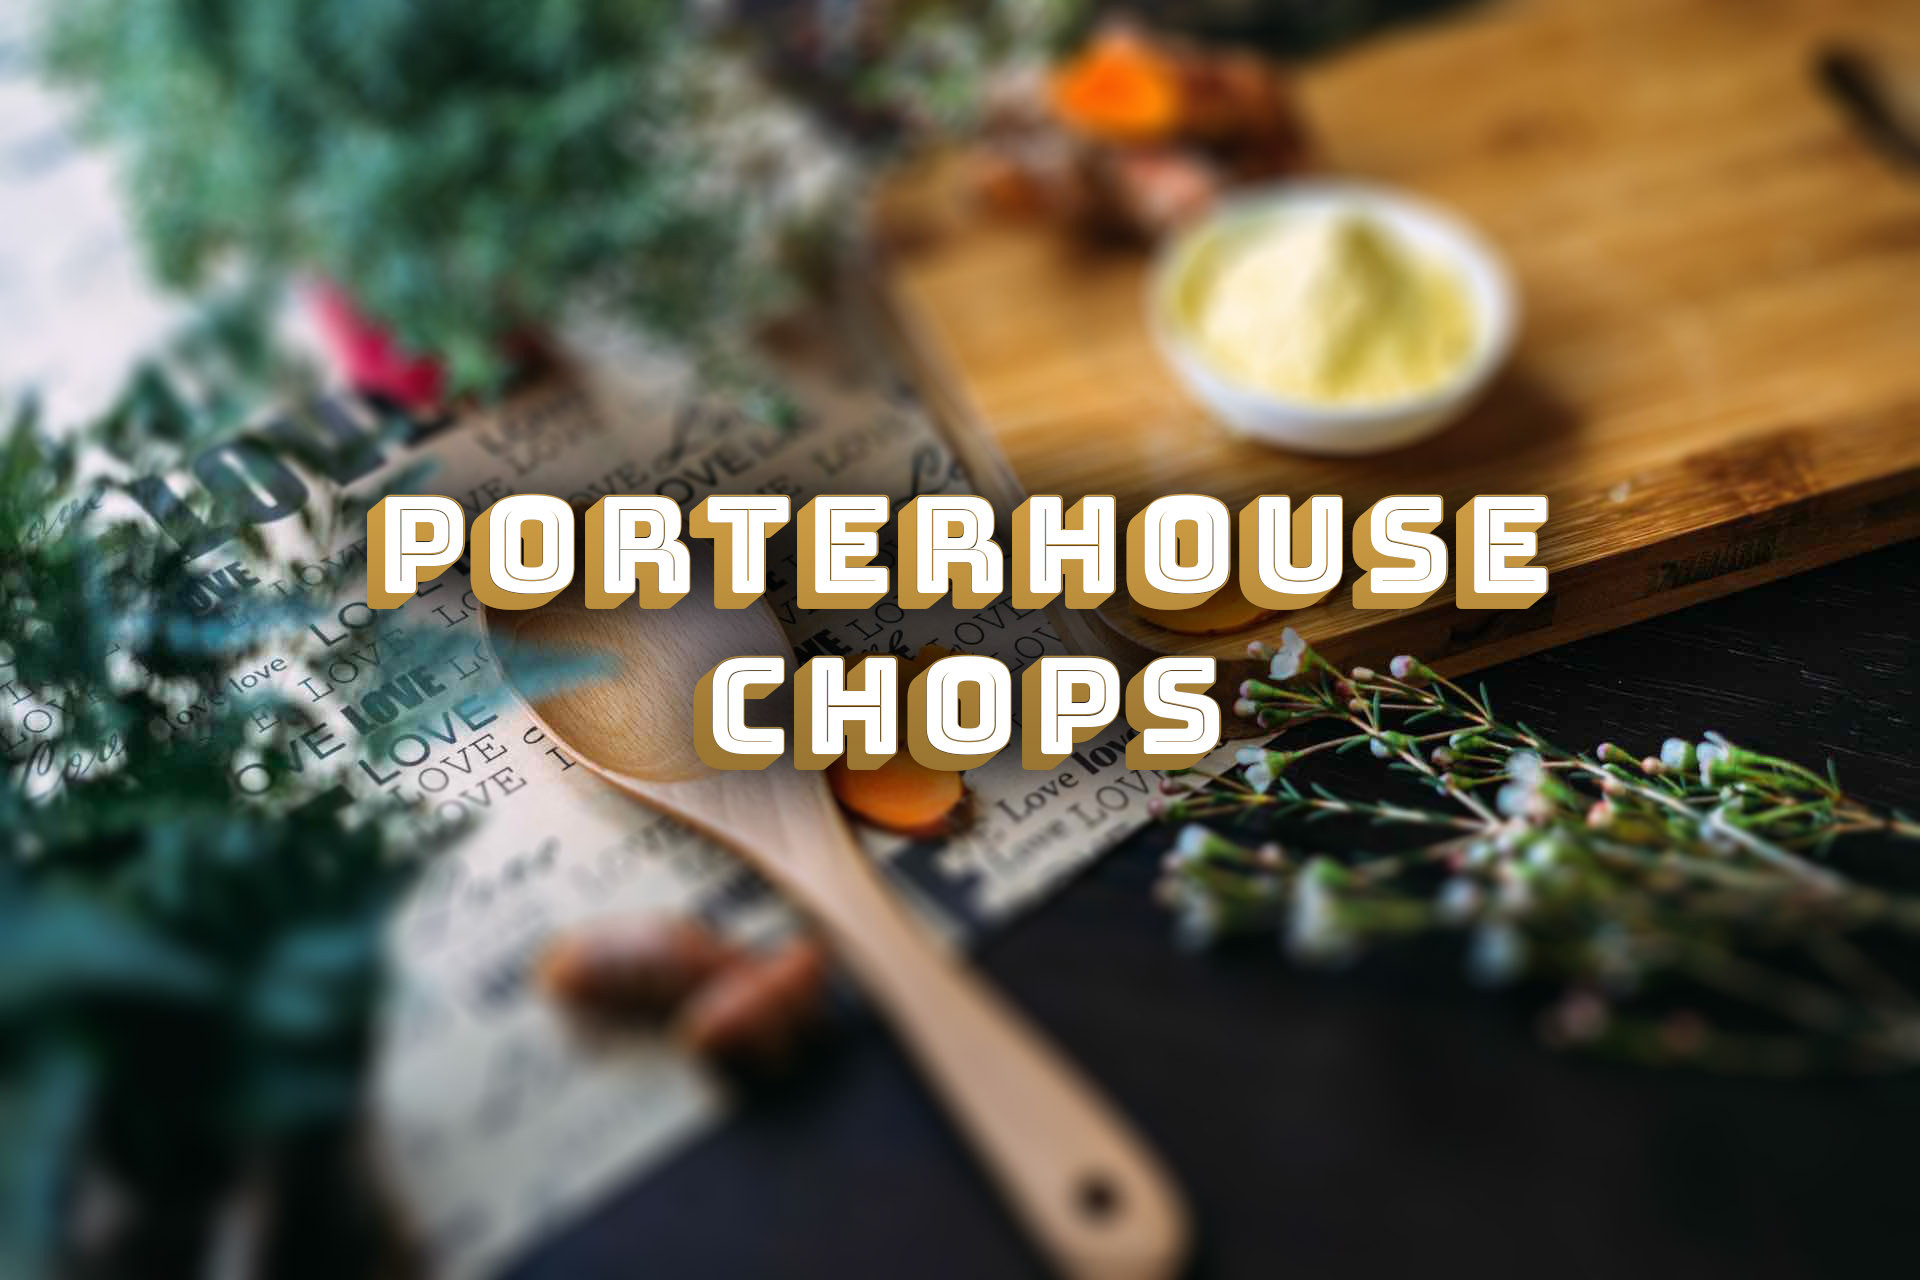 Porterhouse Chops